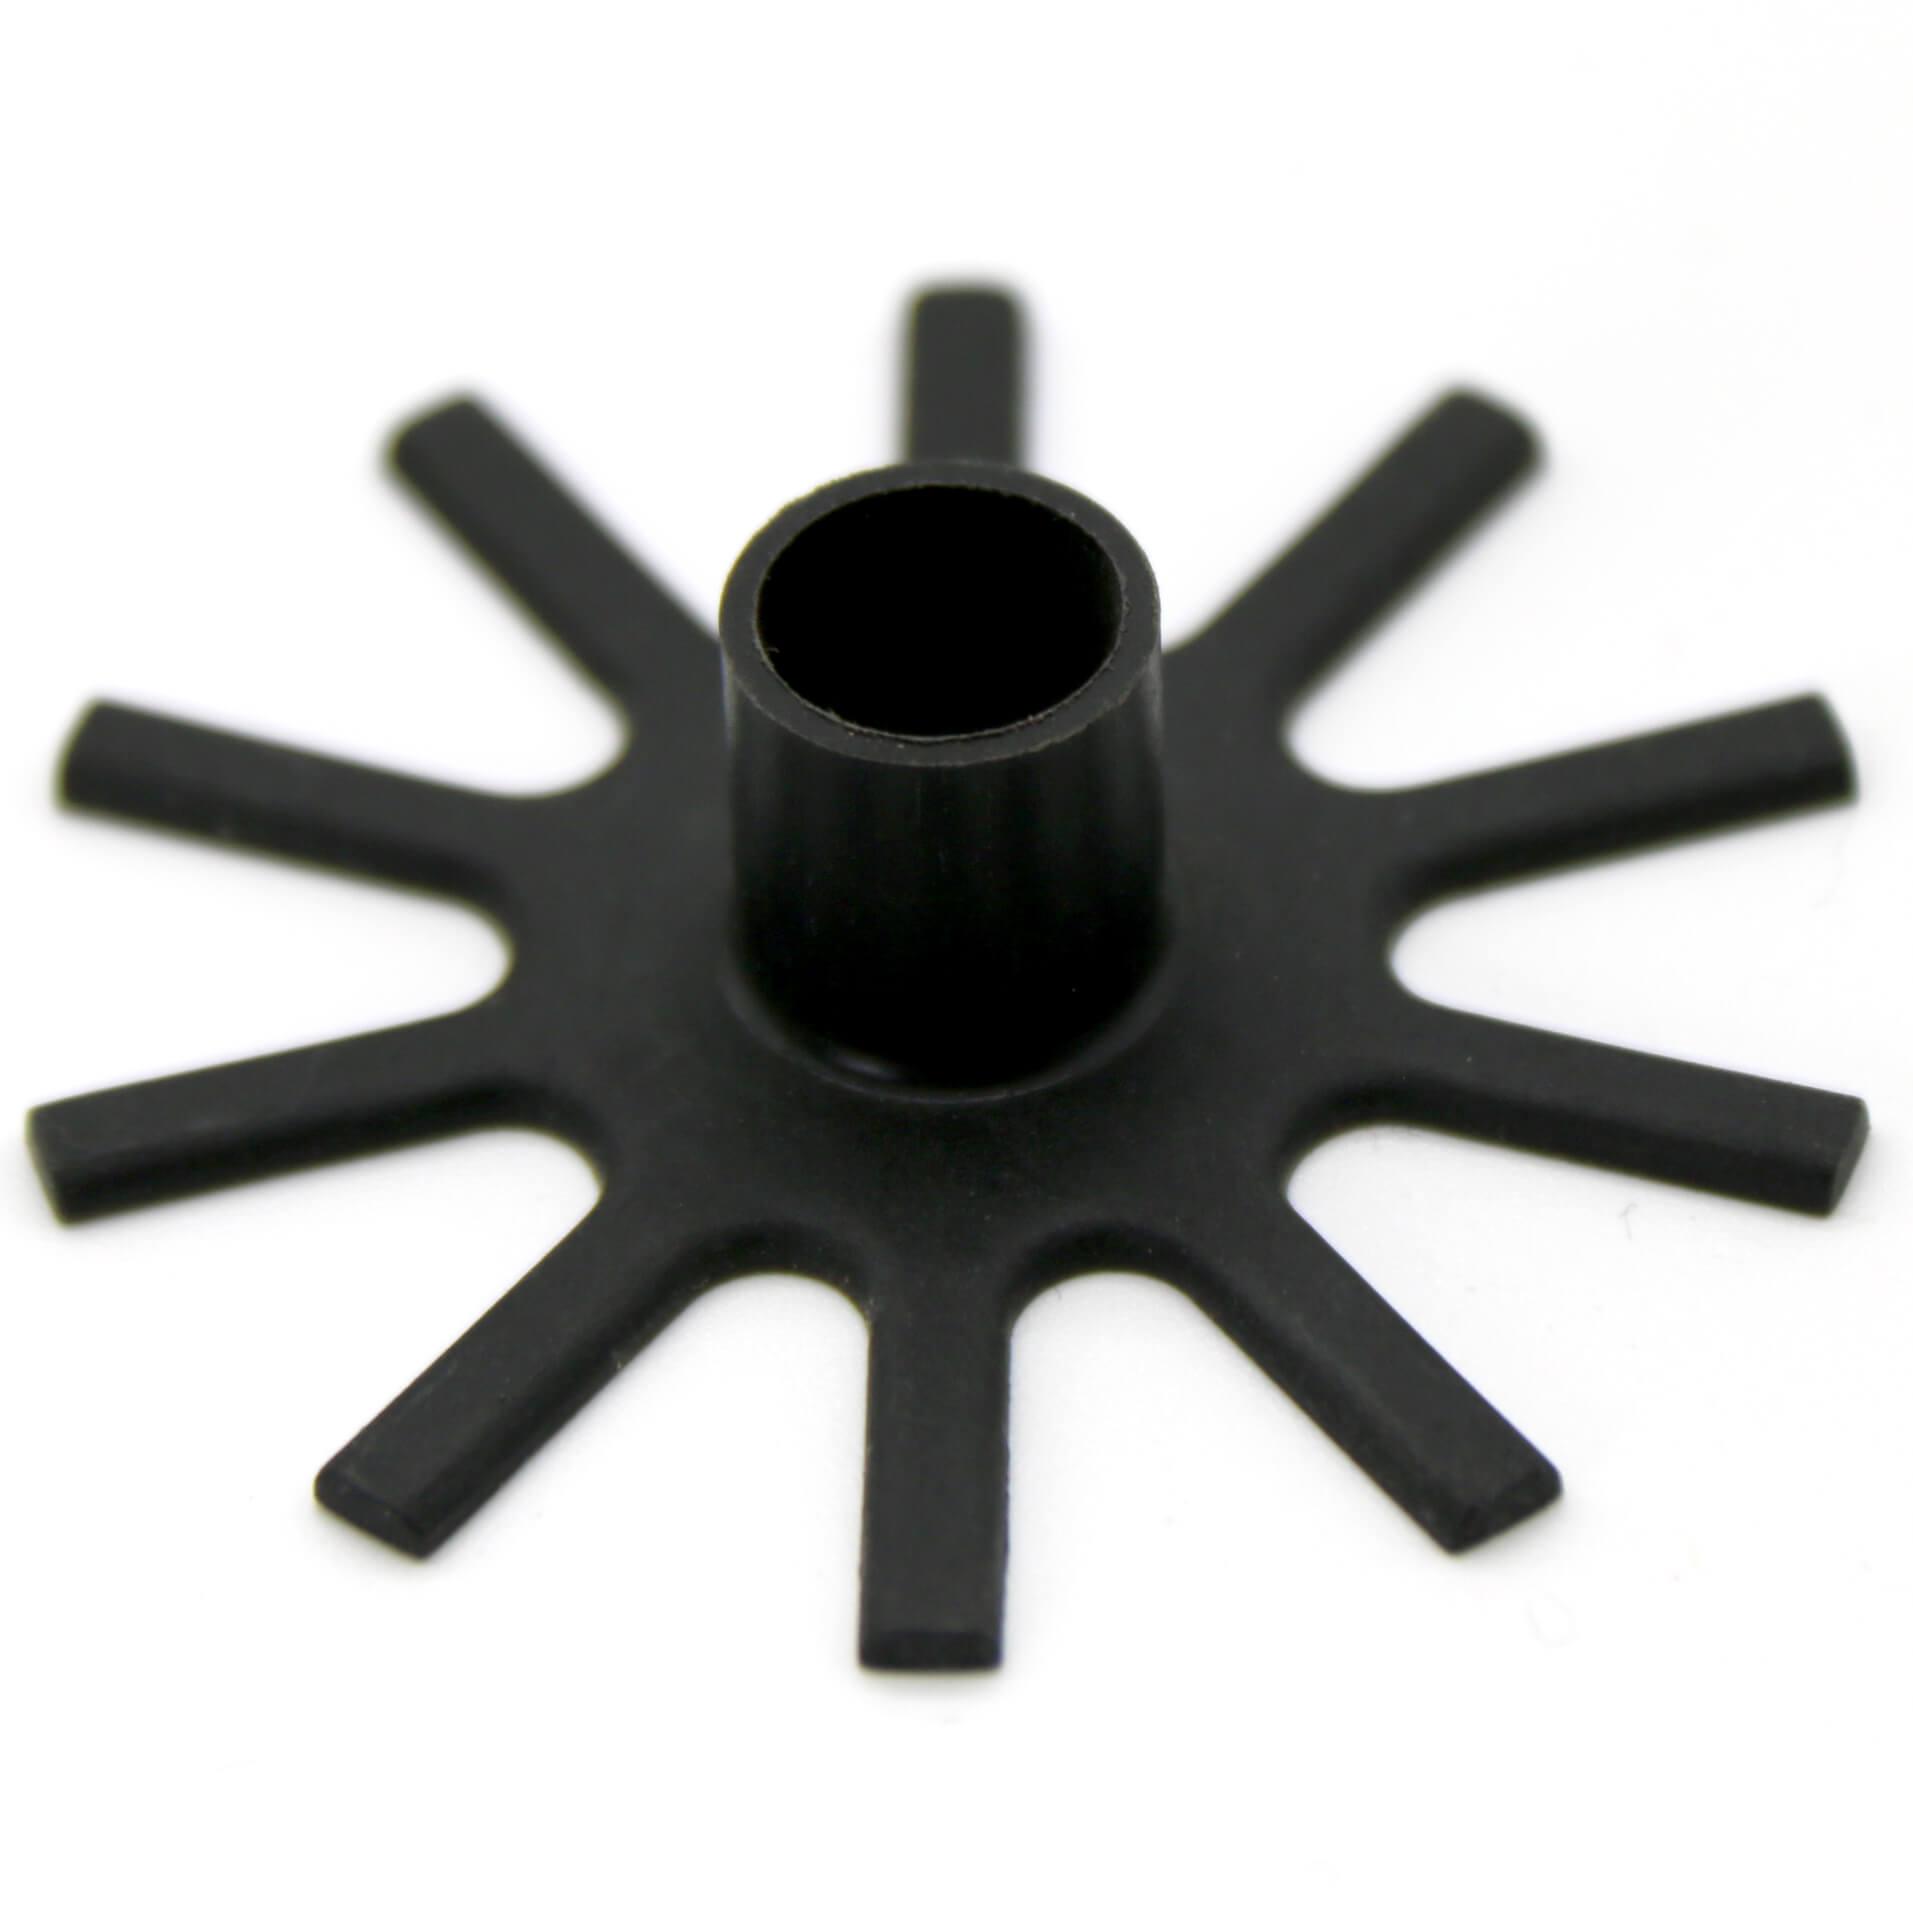 Plastic internal components